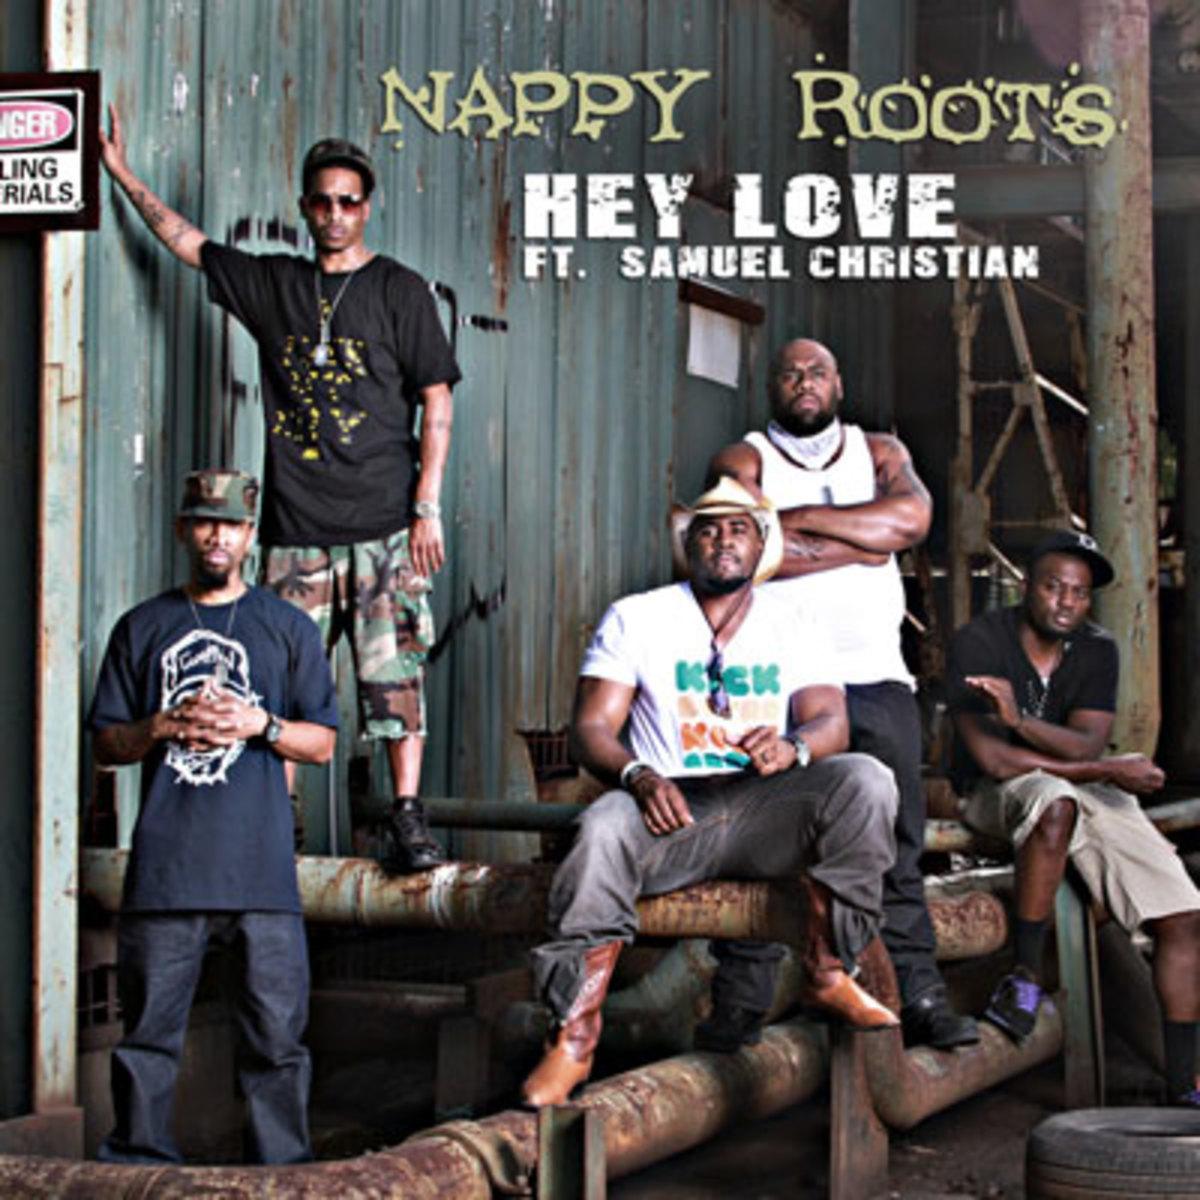 nappyroots-heylove.jpg